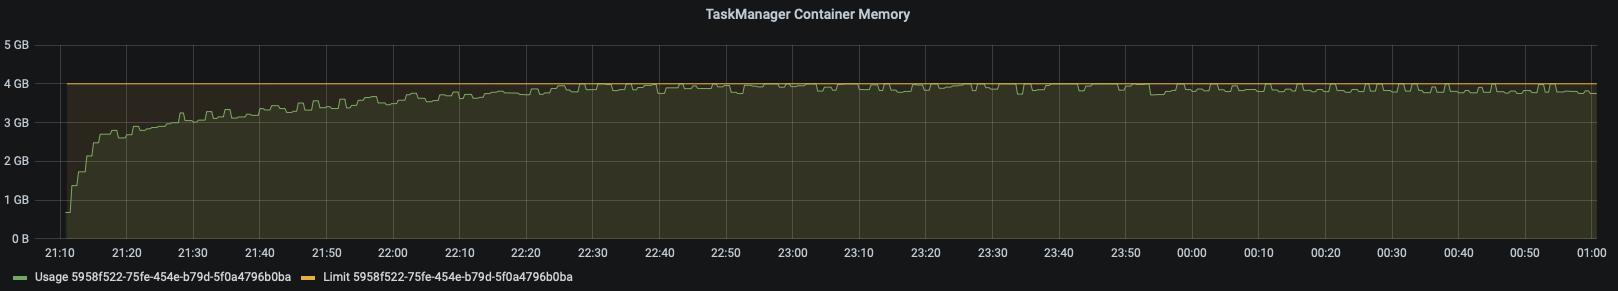 TaskManager Memory, Ververica Platform, Apache Flink